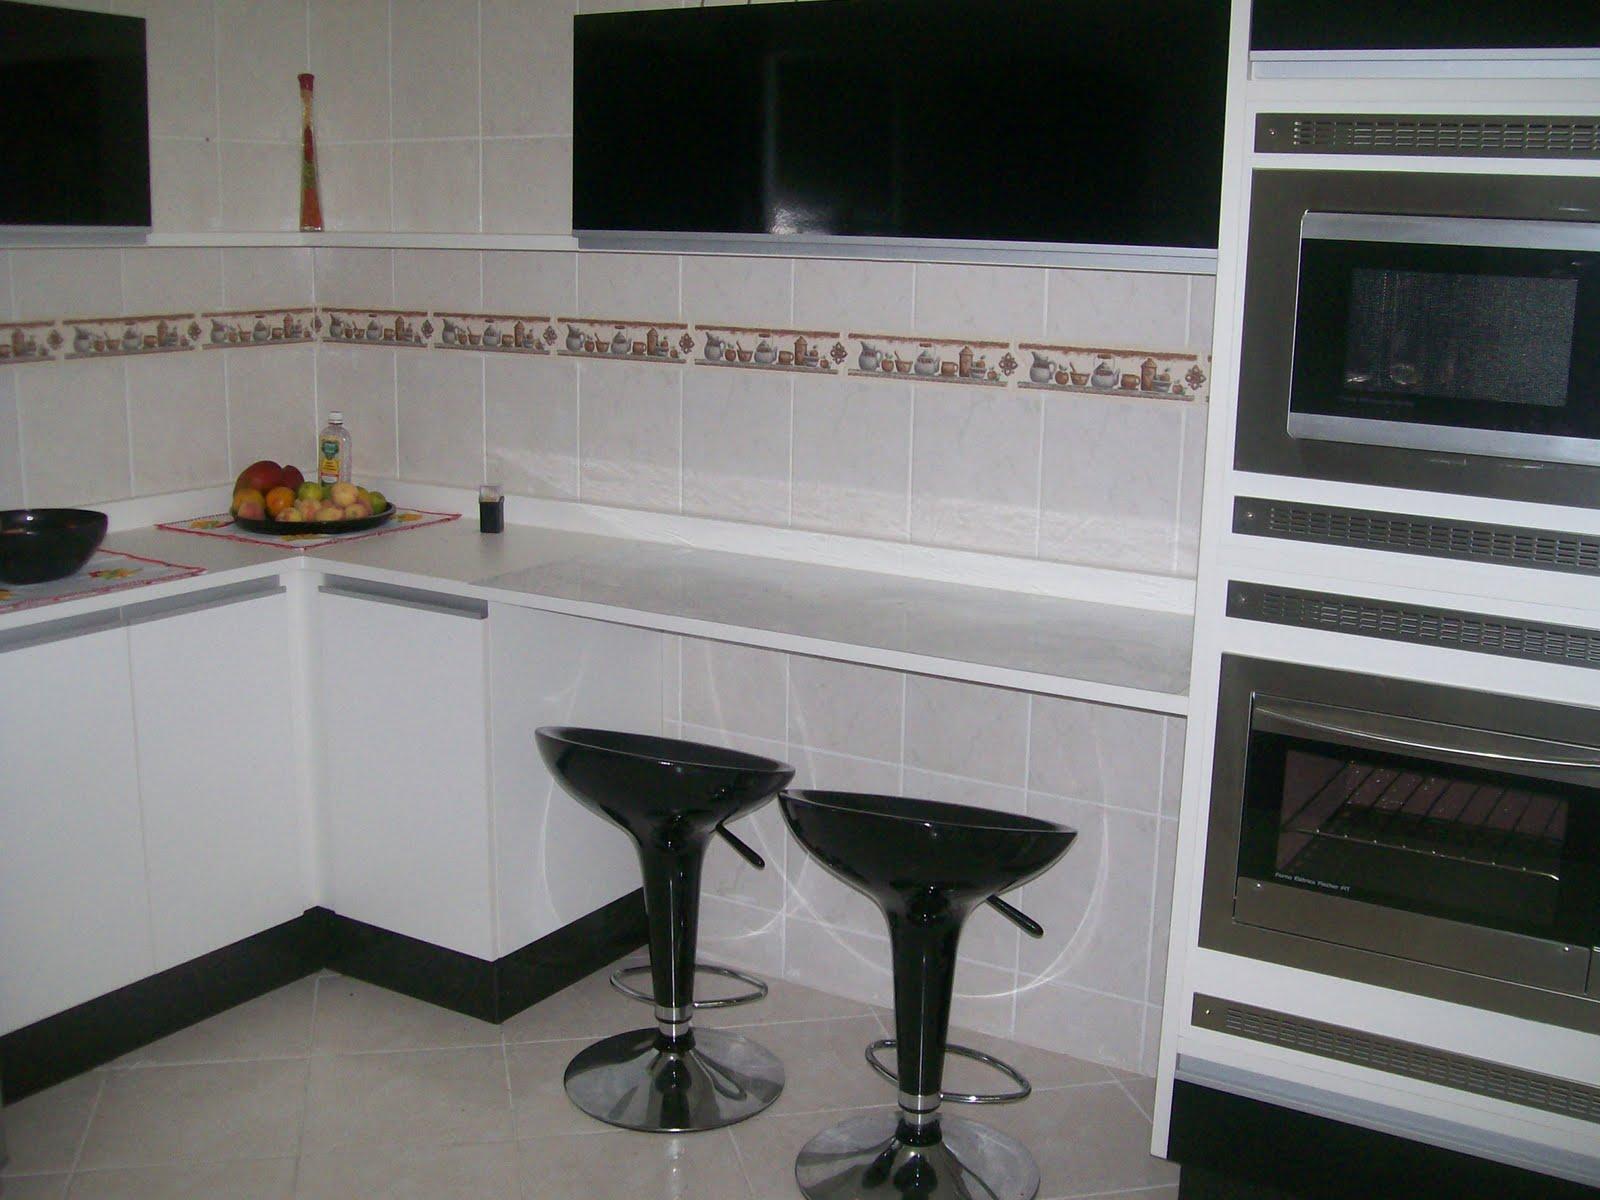 Banquetas para cozinha O estilo das banquetas para HD Wallpapers #63493C 1600 1200